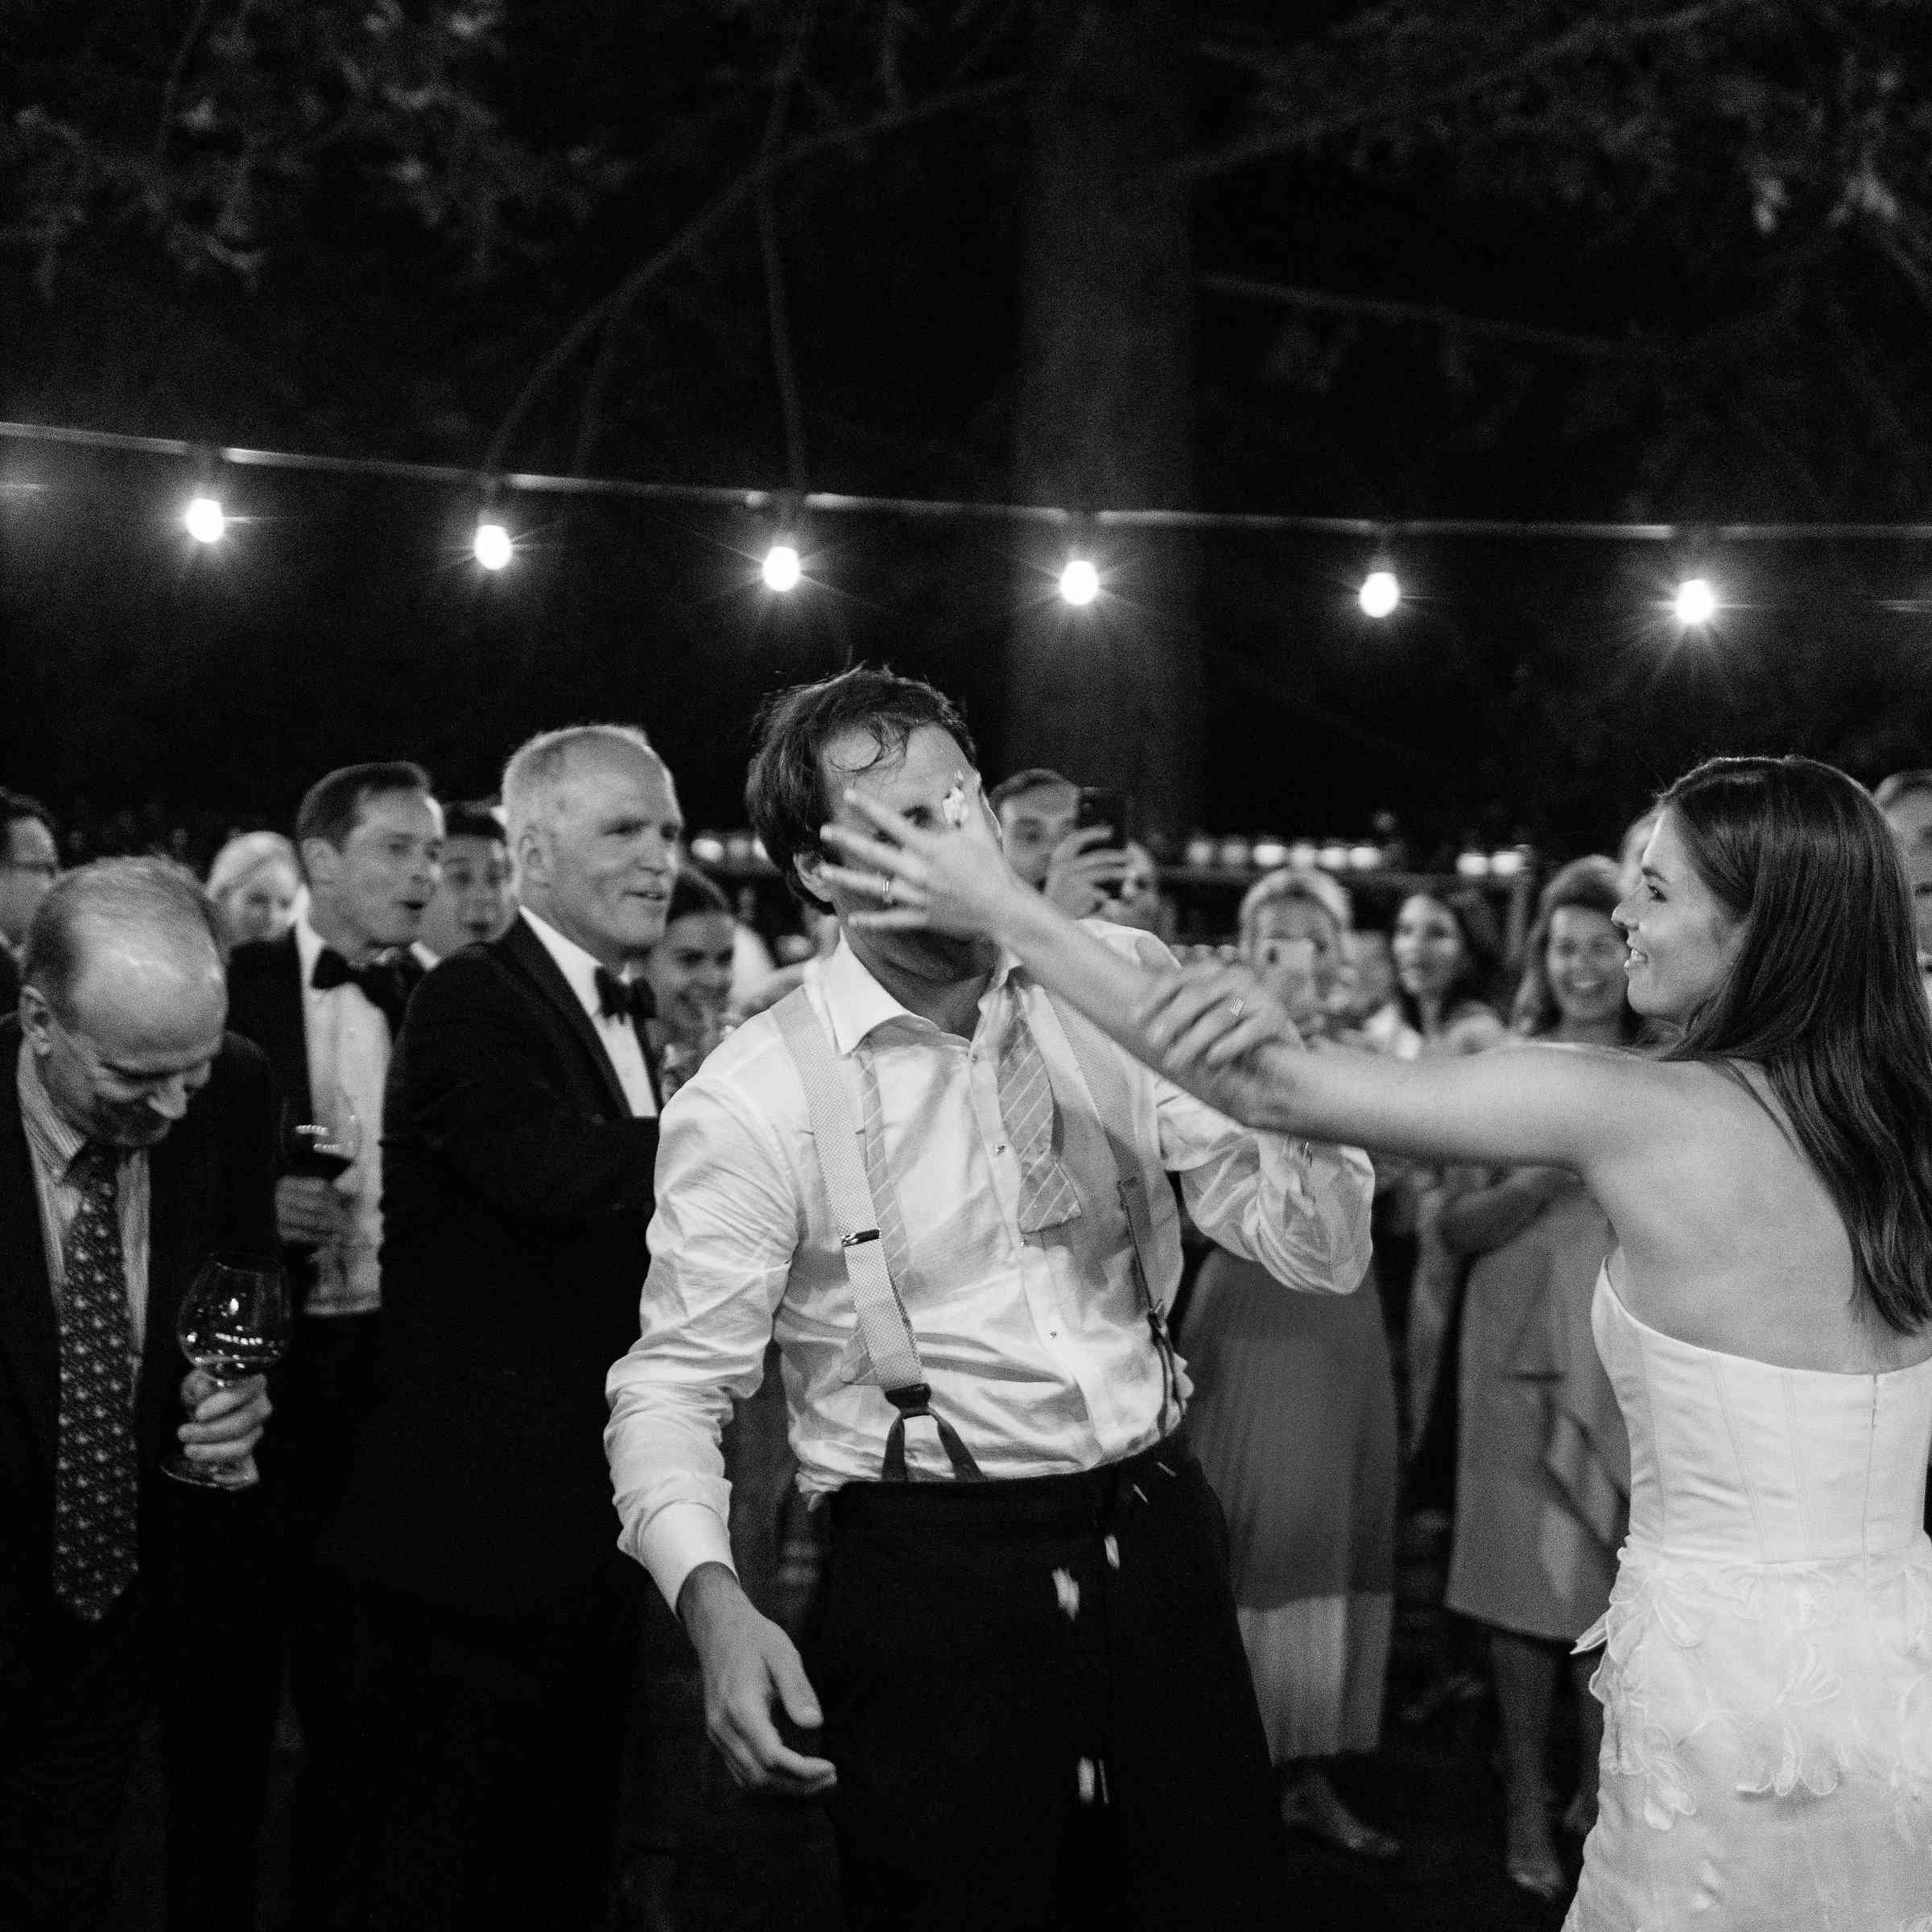 <p>bride throwing cake at groom</p><br><br>